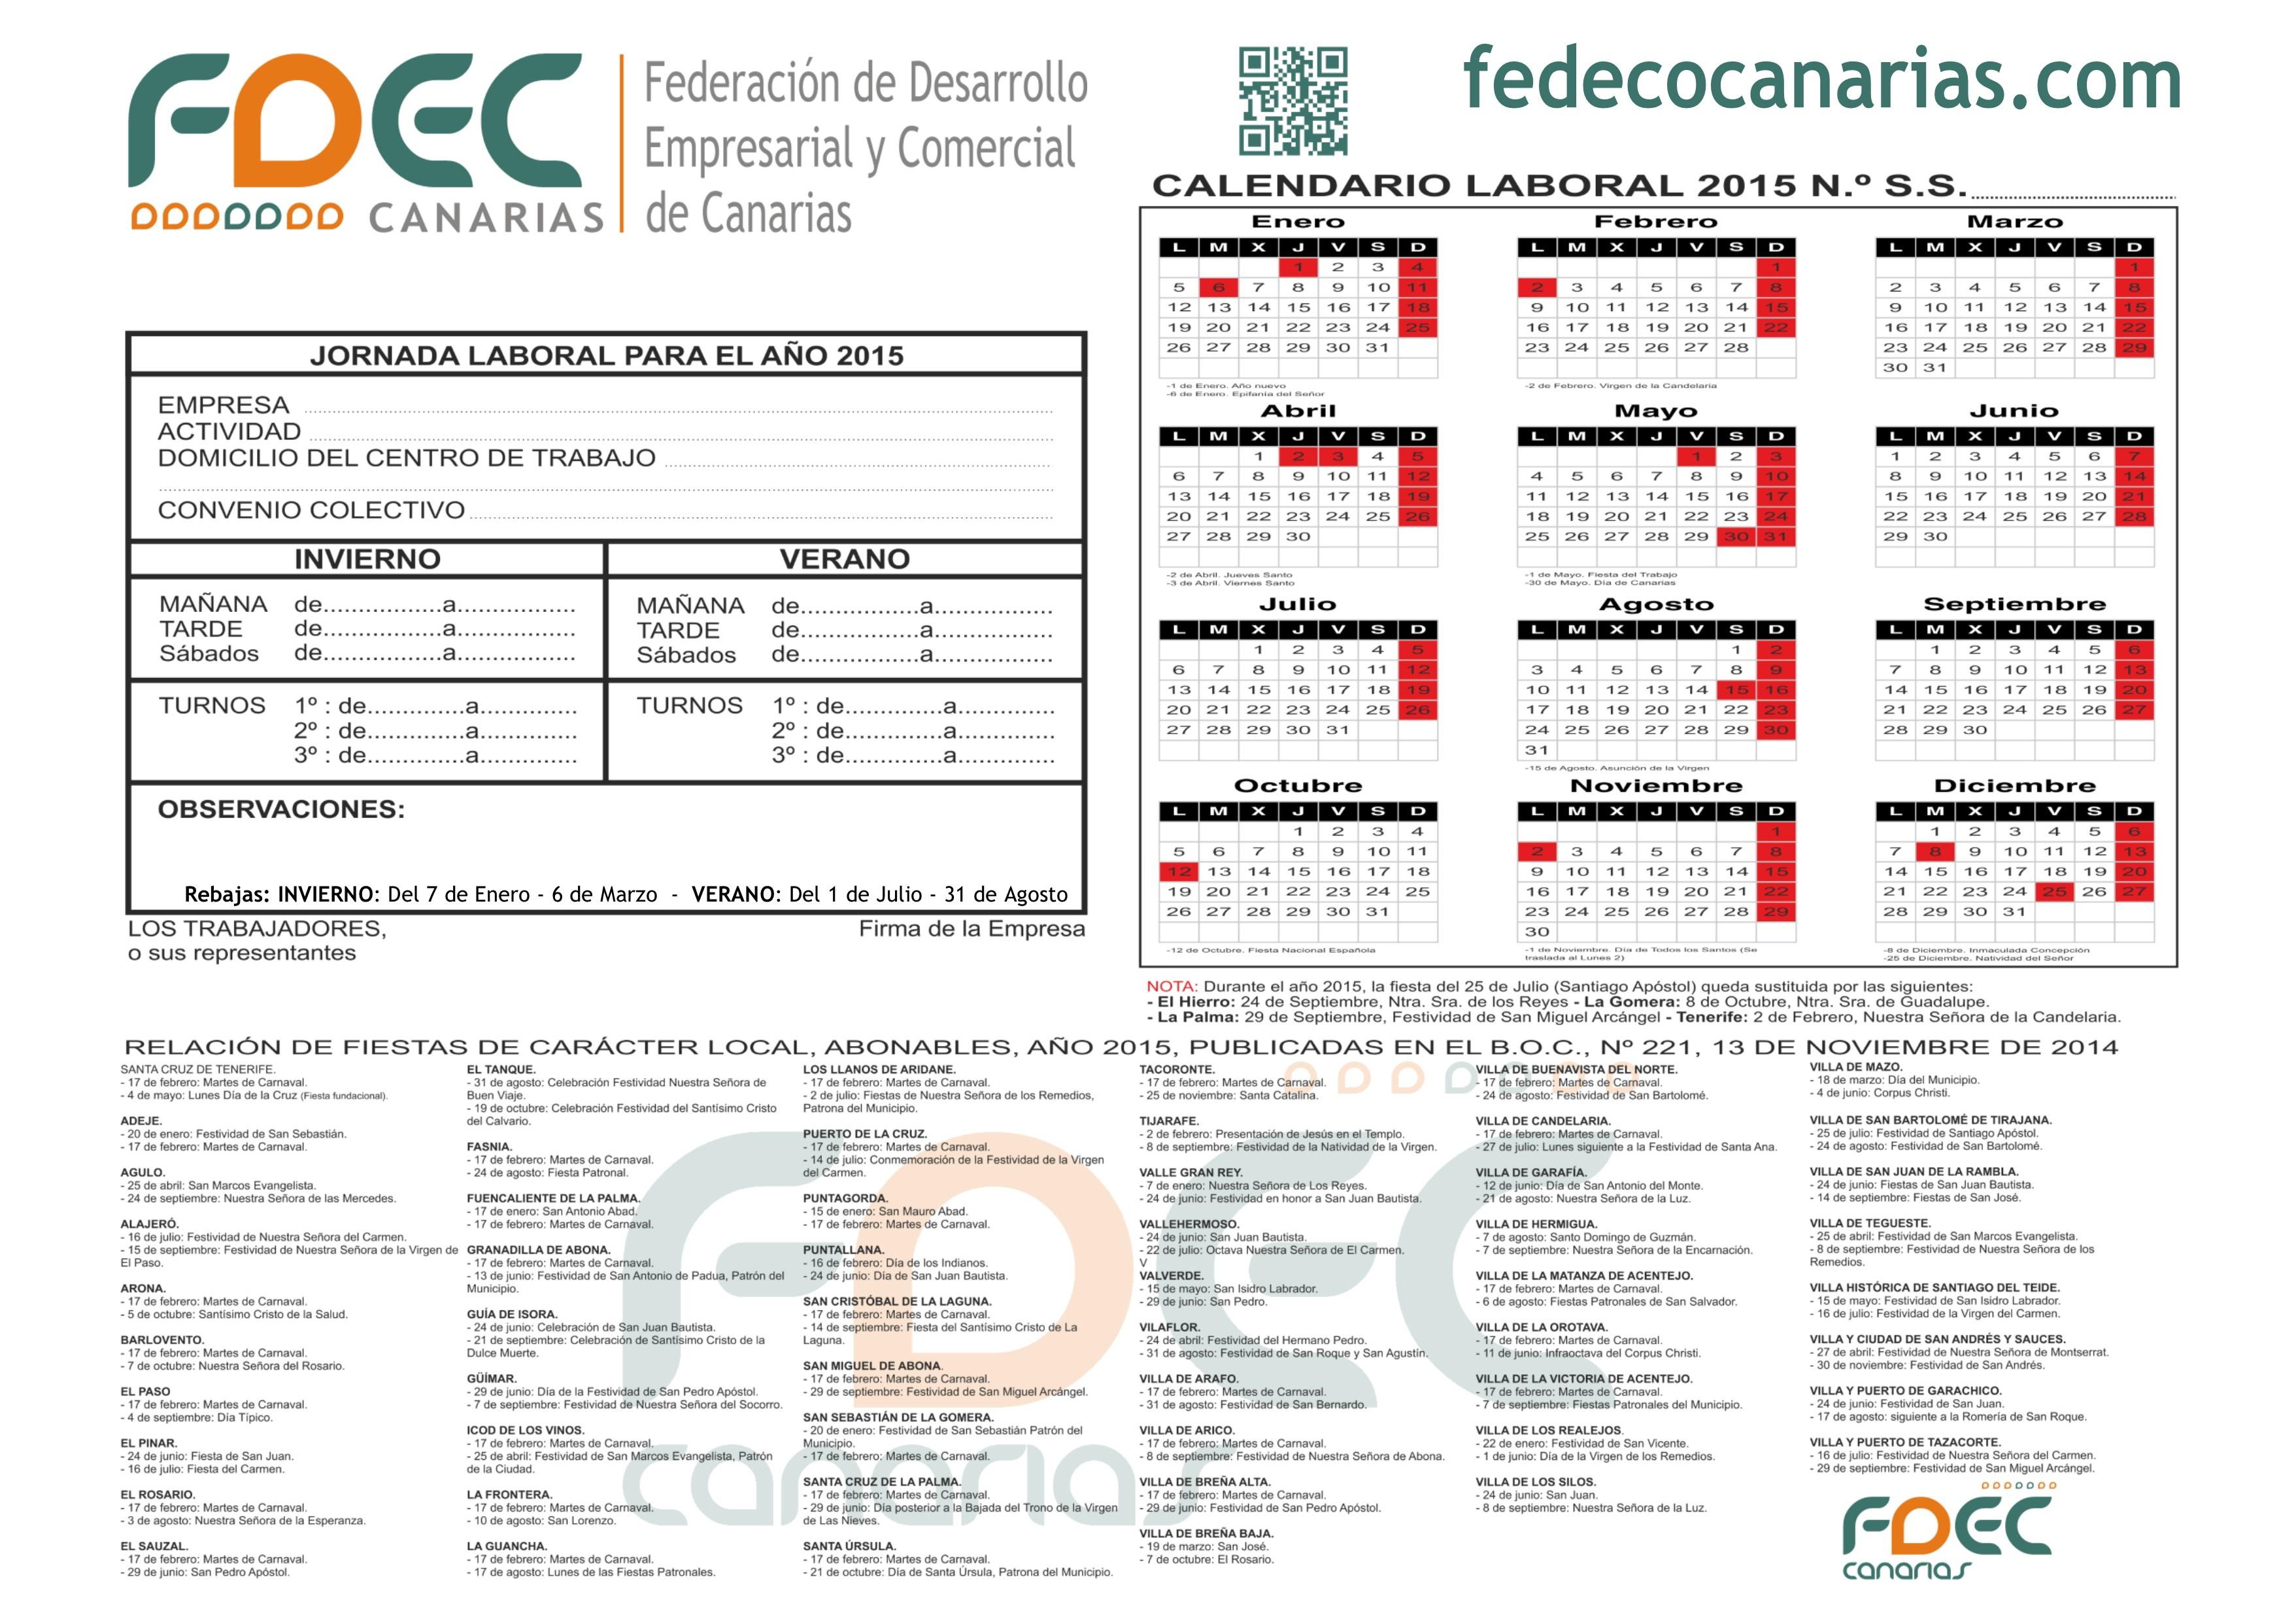 Calendario Laboral 2015 FDEC